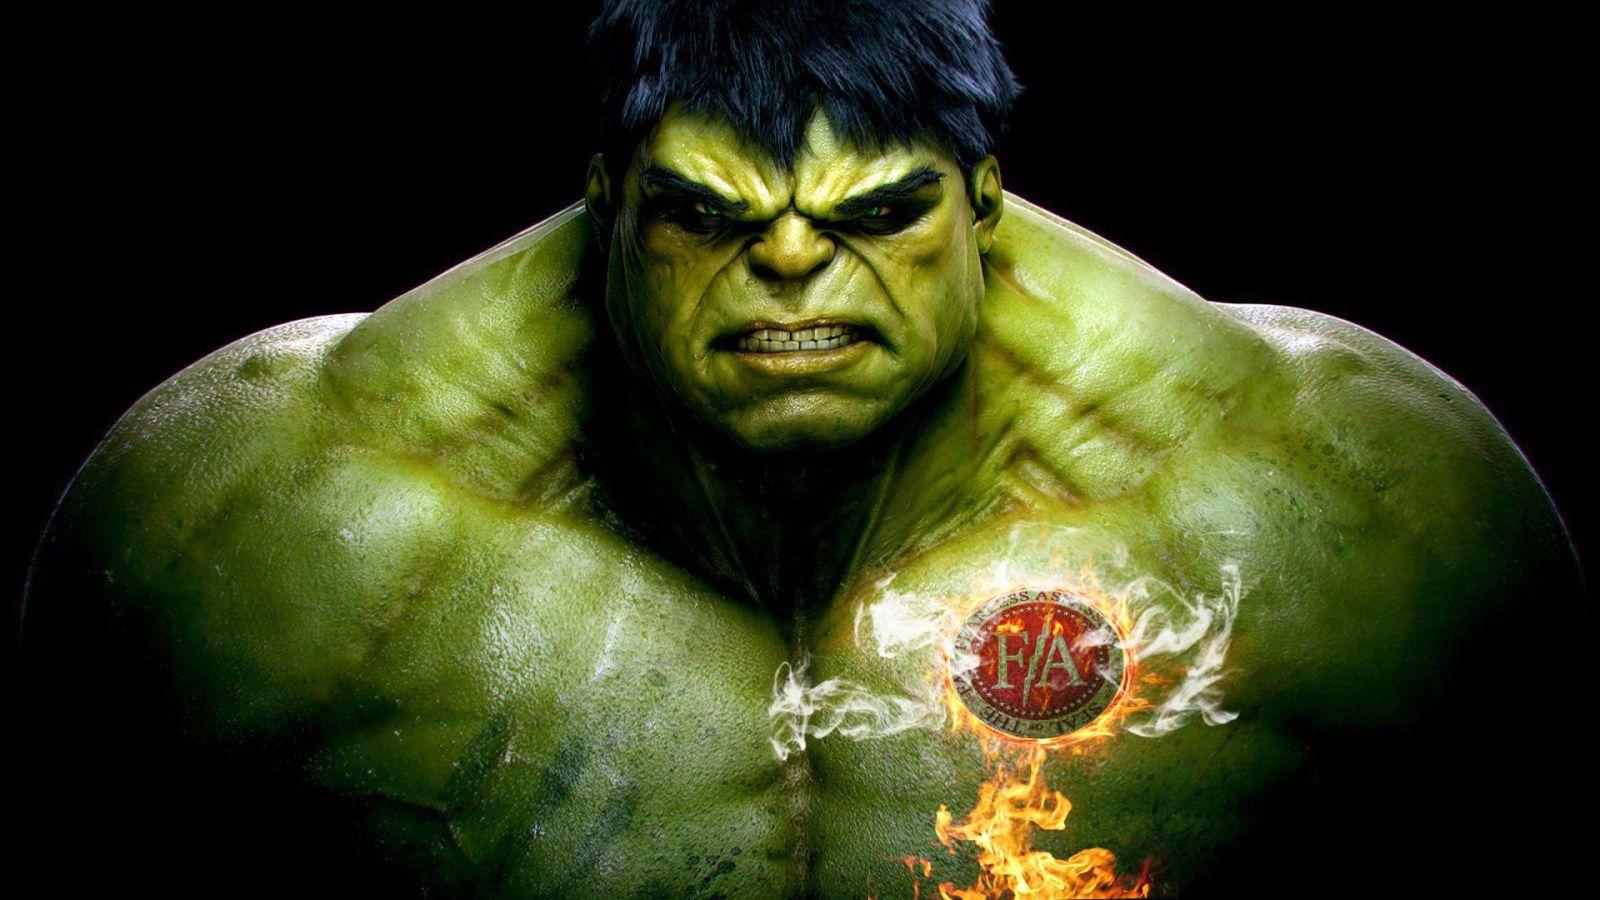 Hulk FA HD